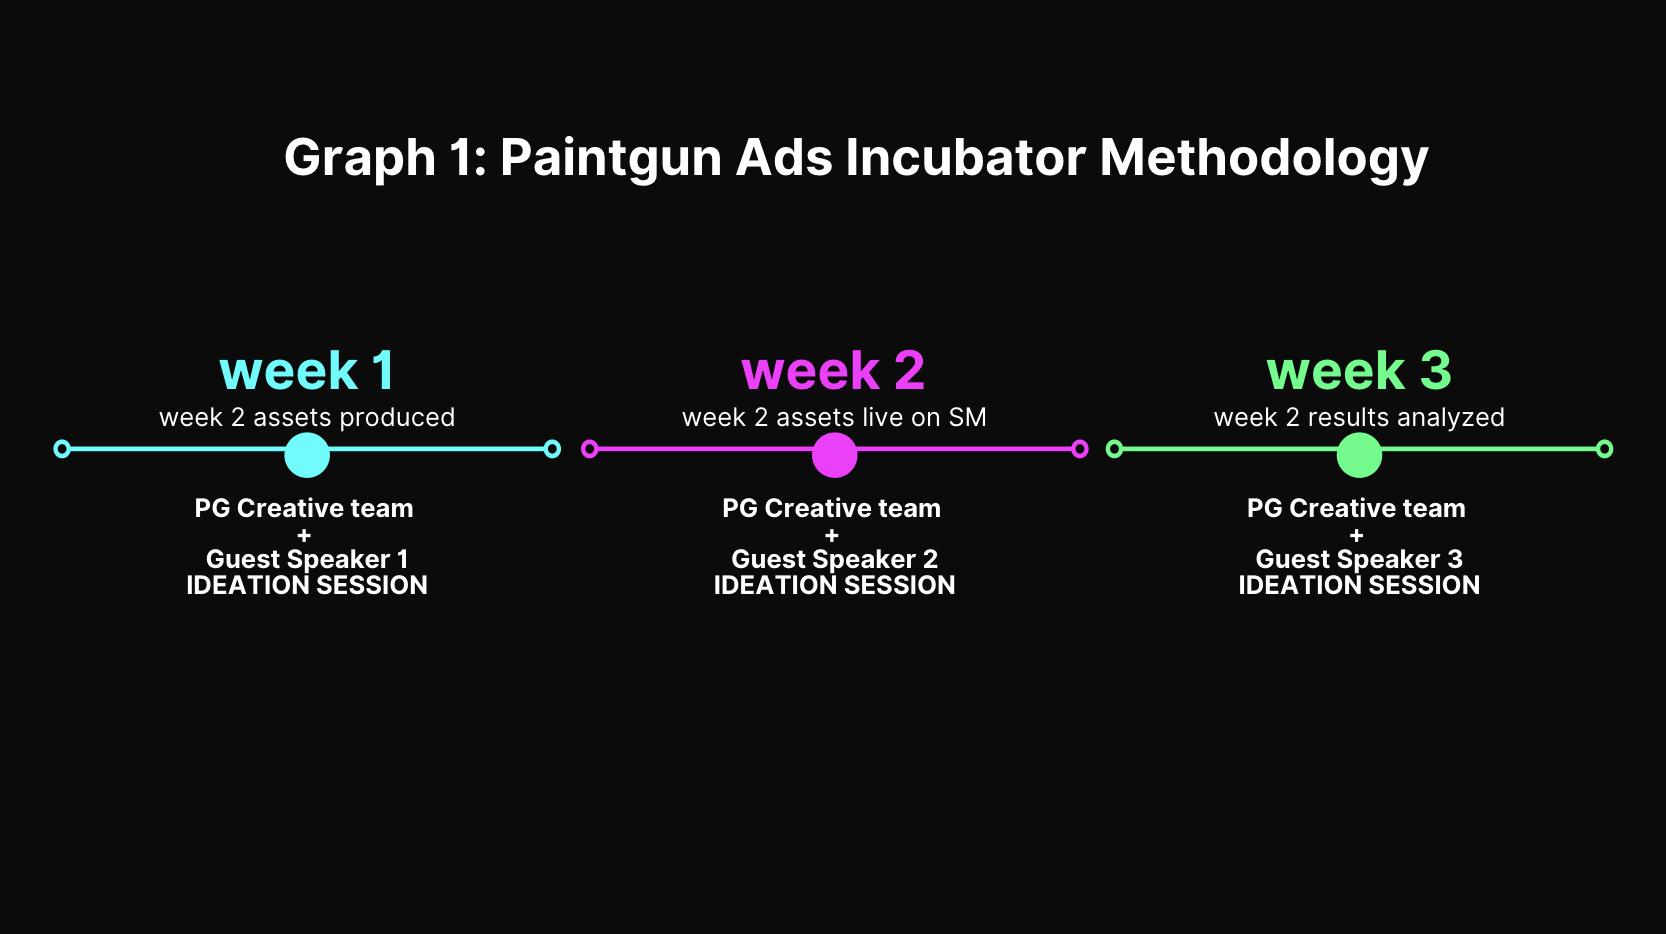 Paintgun Ads Incubator Methodology